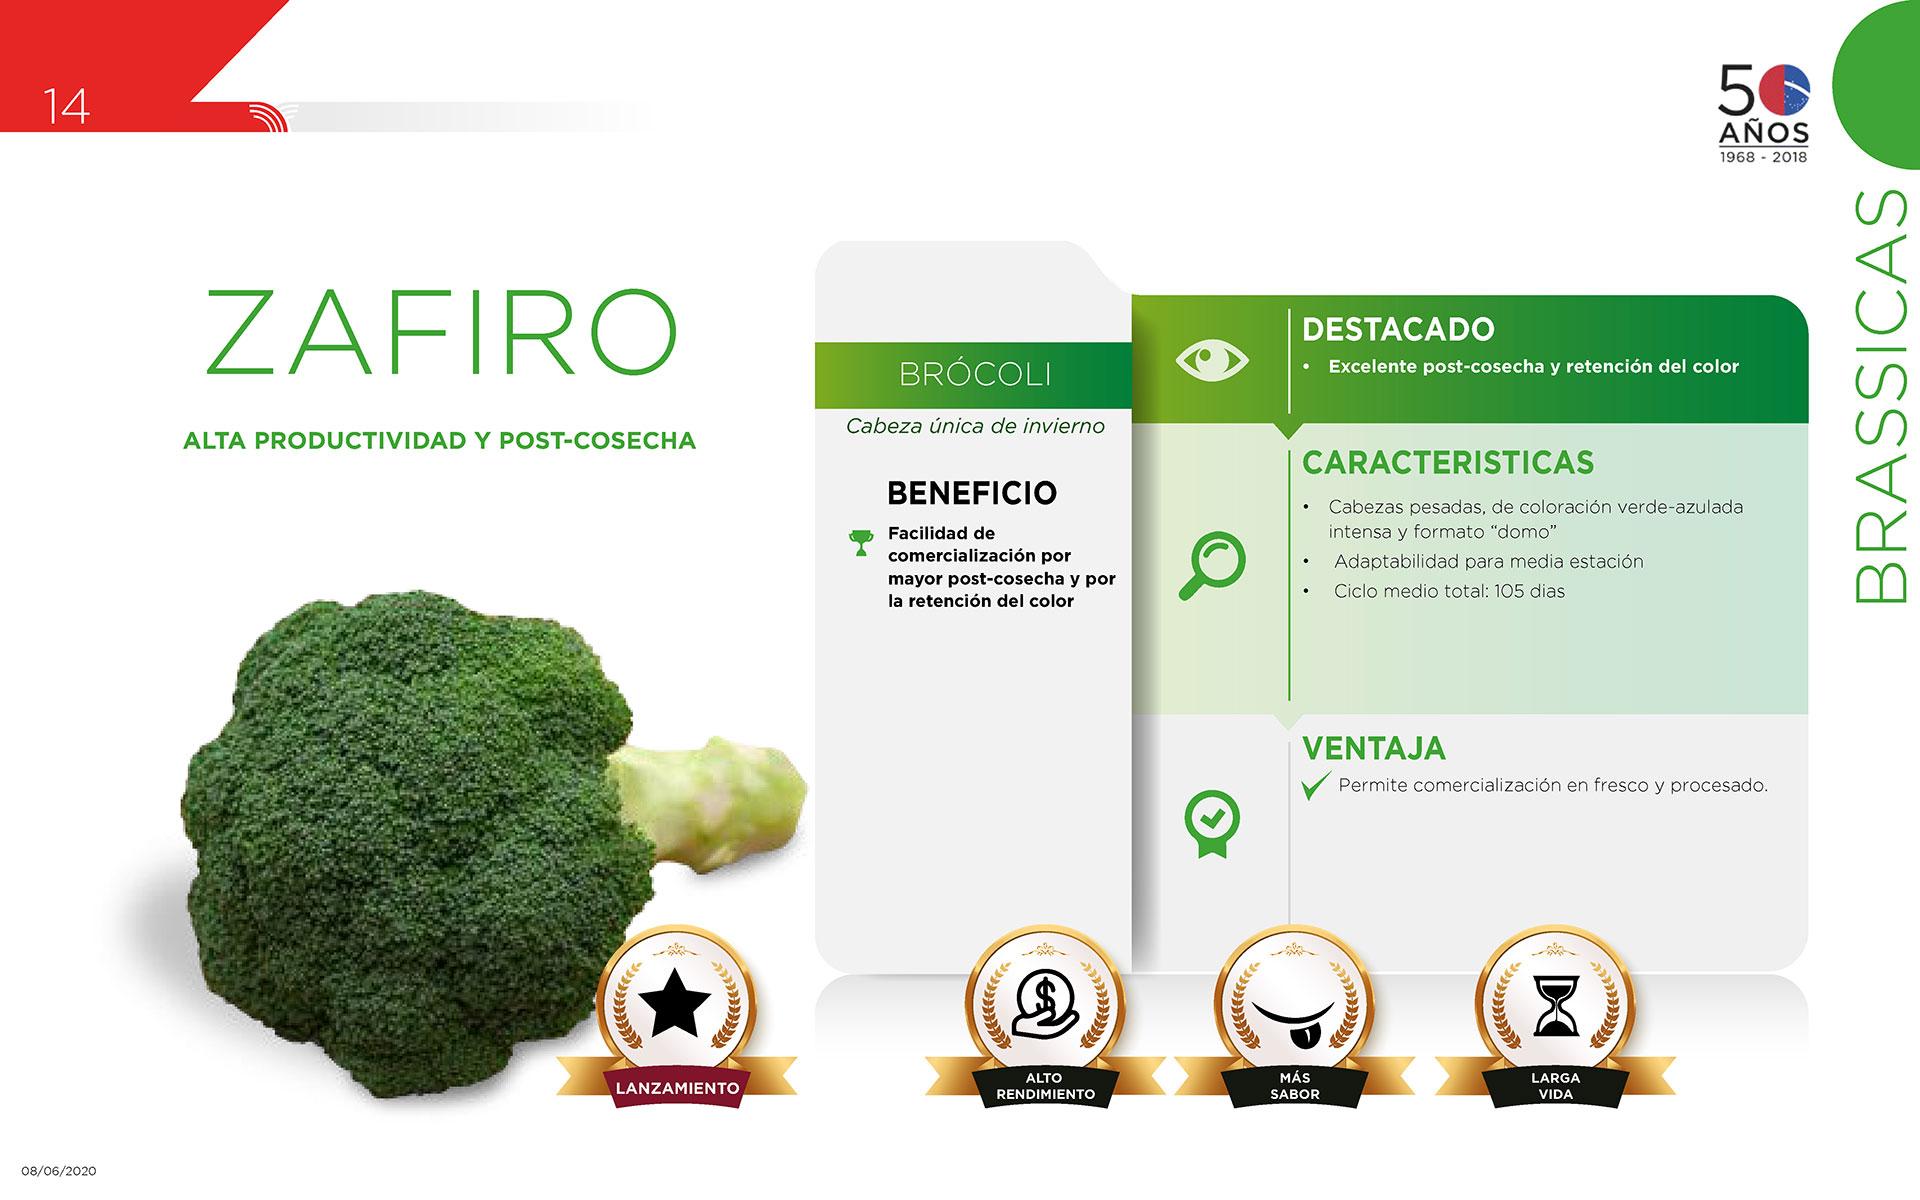 Zafiro - Brassicas